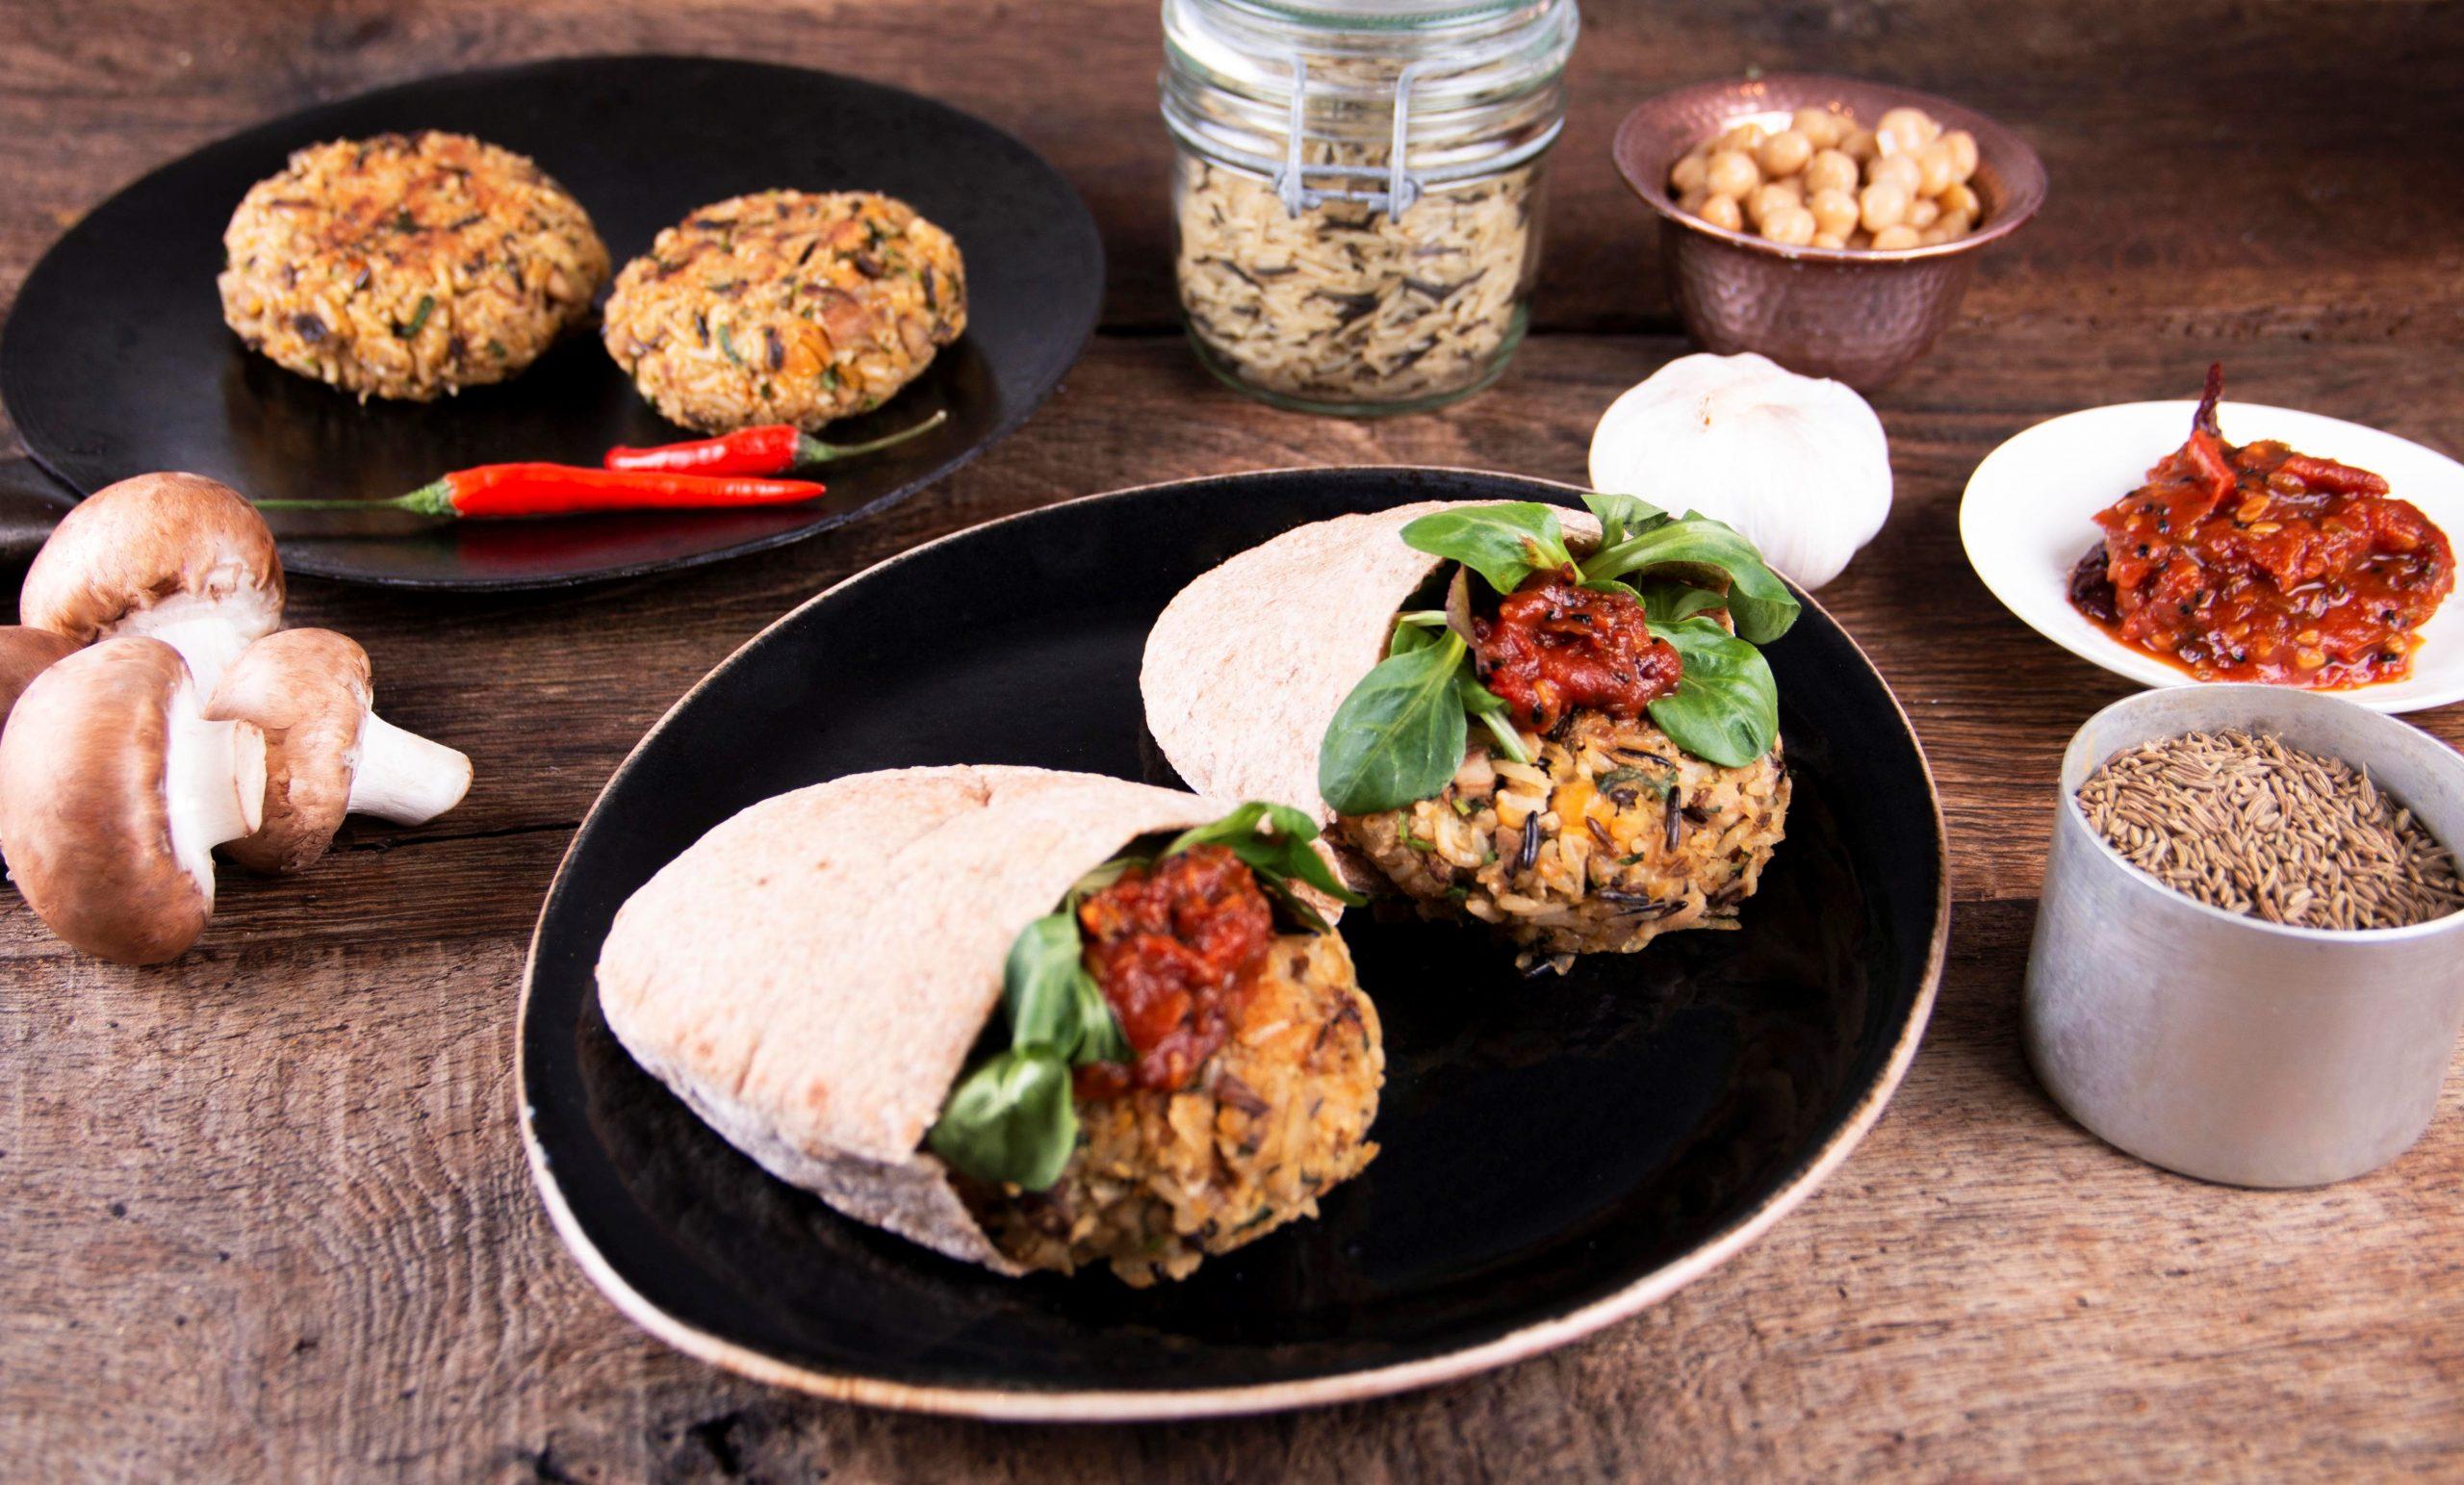 Wild Rice and Mushroom Burger Patties